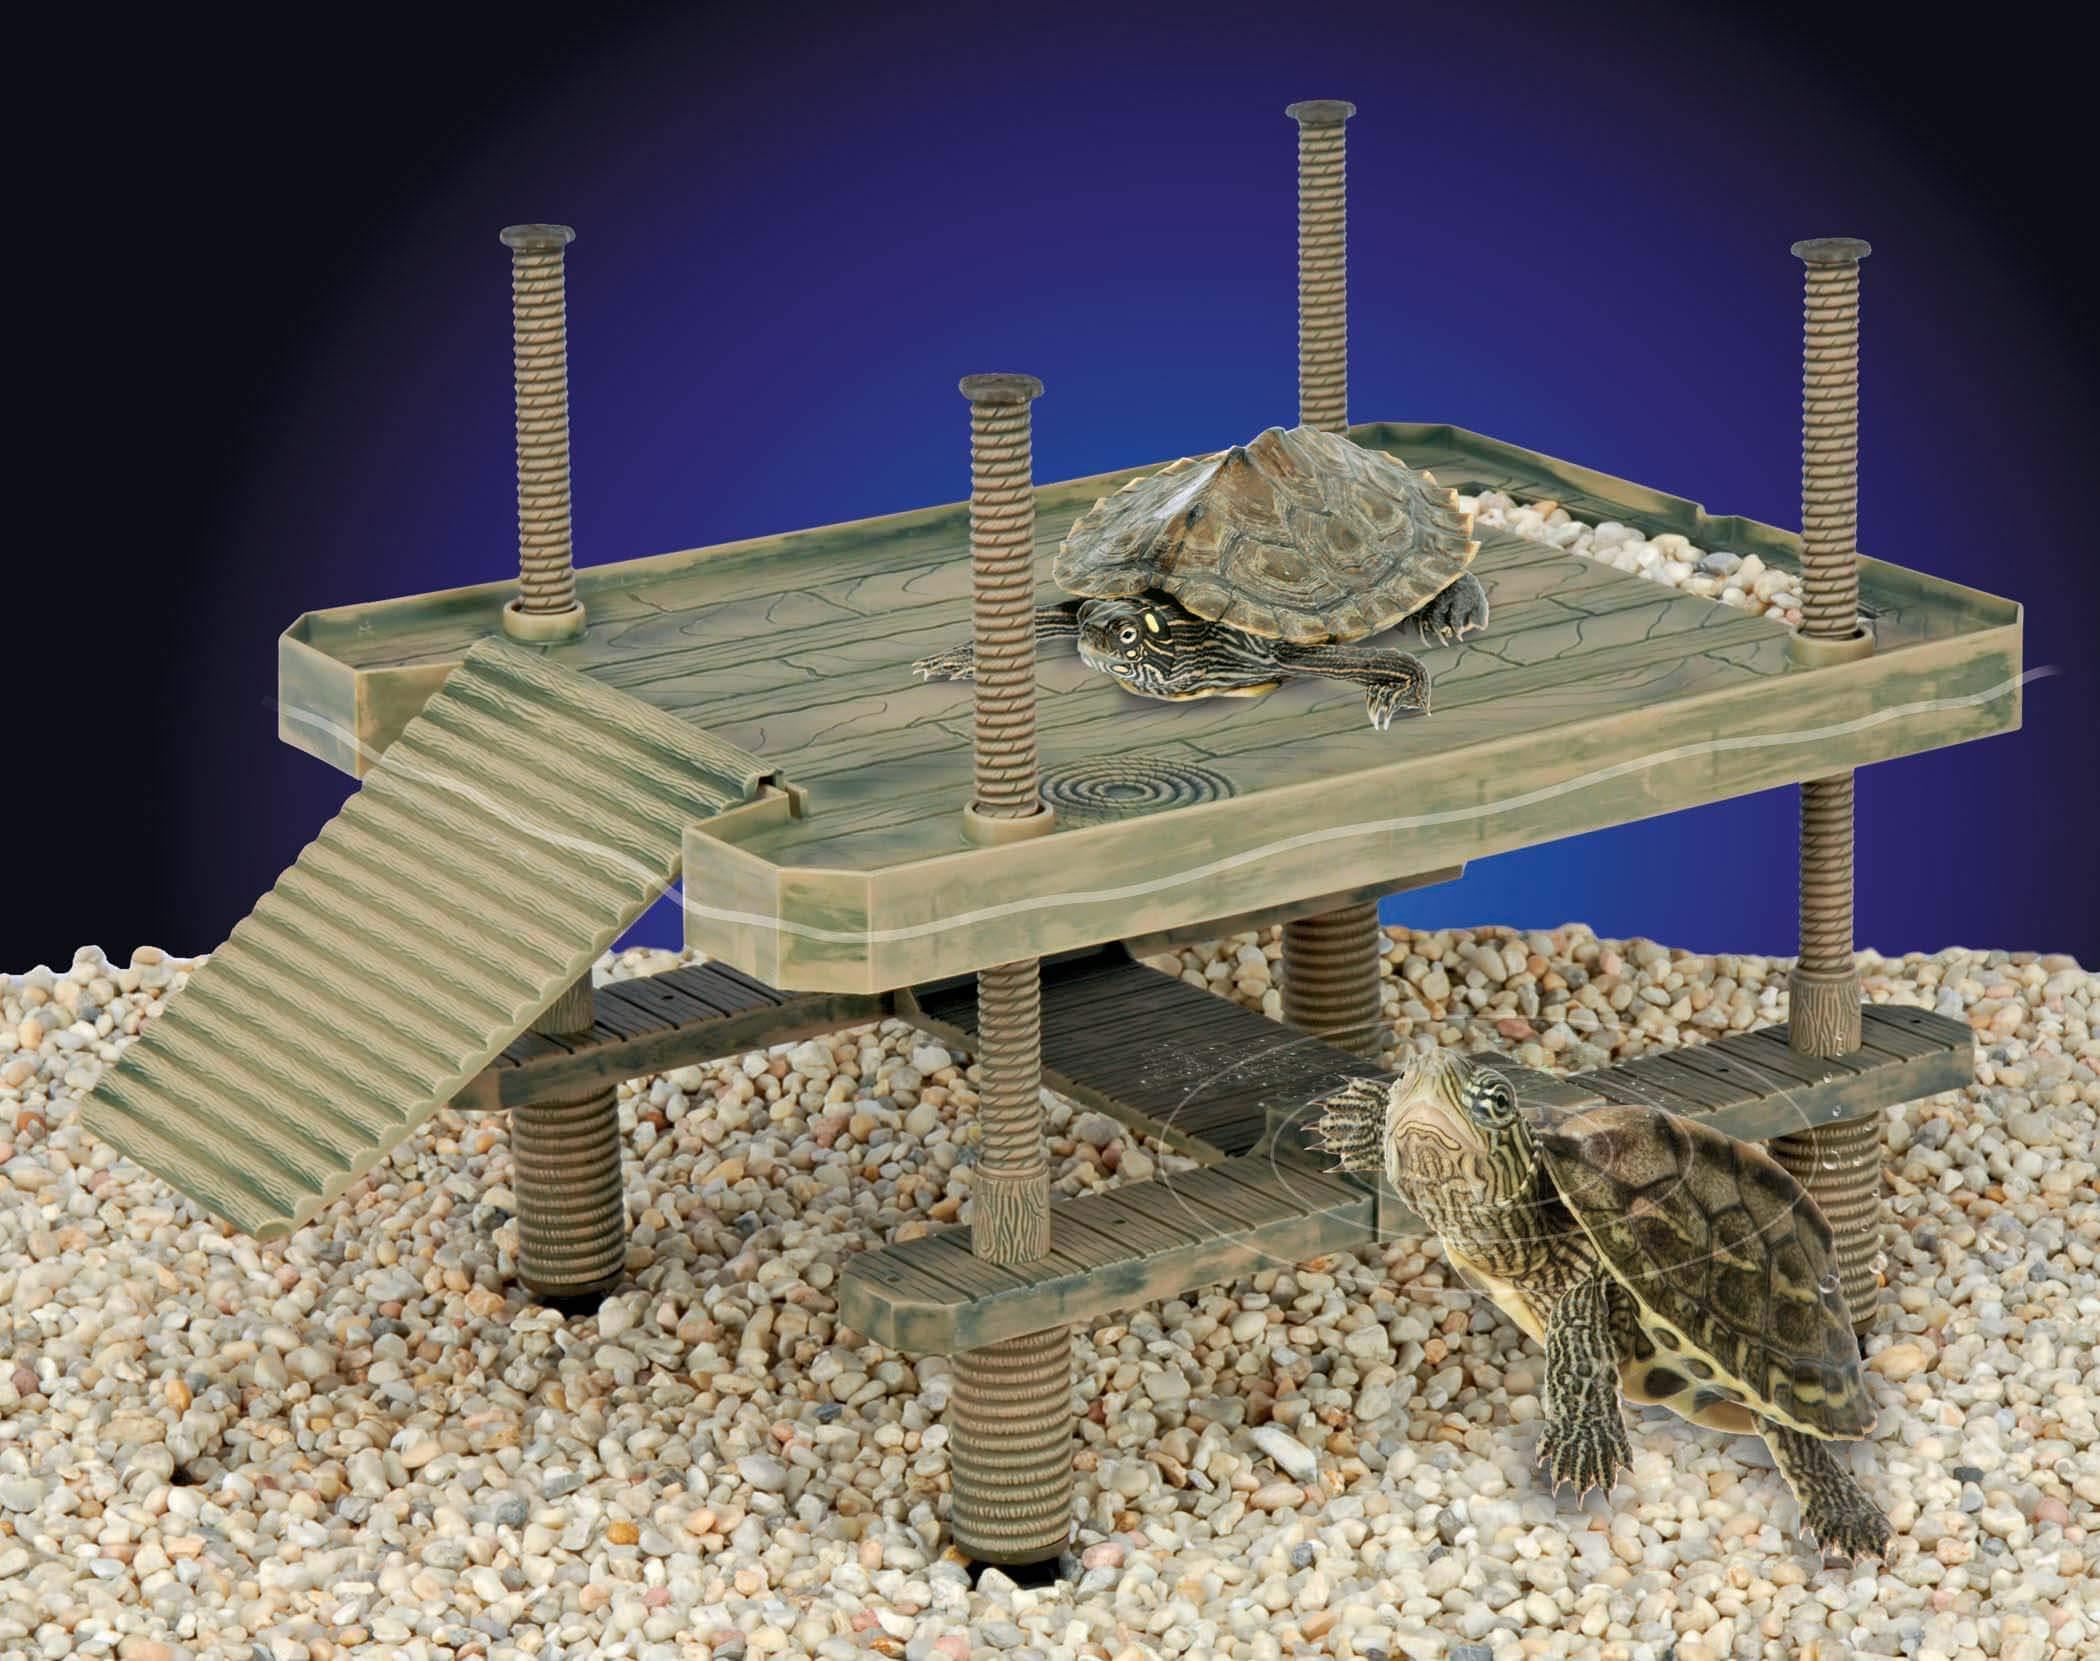 Penn Plax Decorative Turtle Pier Floating/Basking Platform, Large by Penn Plax